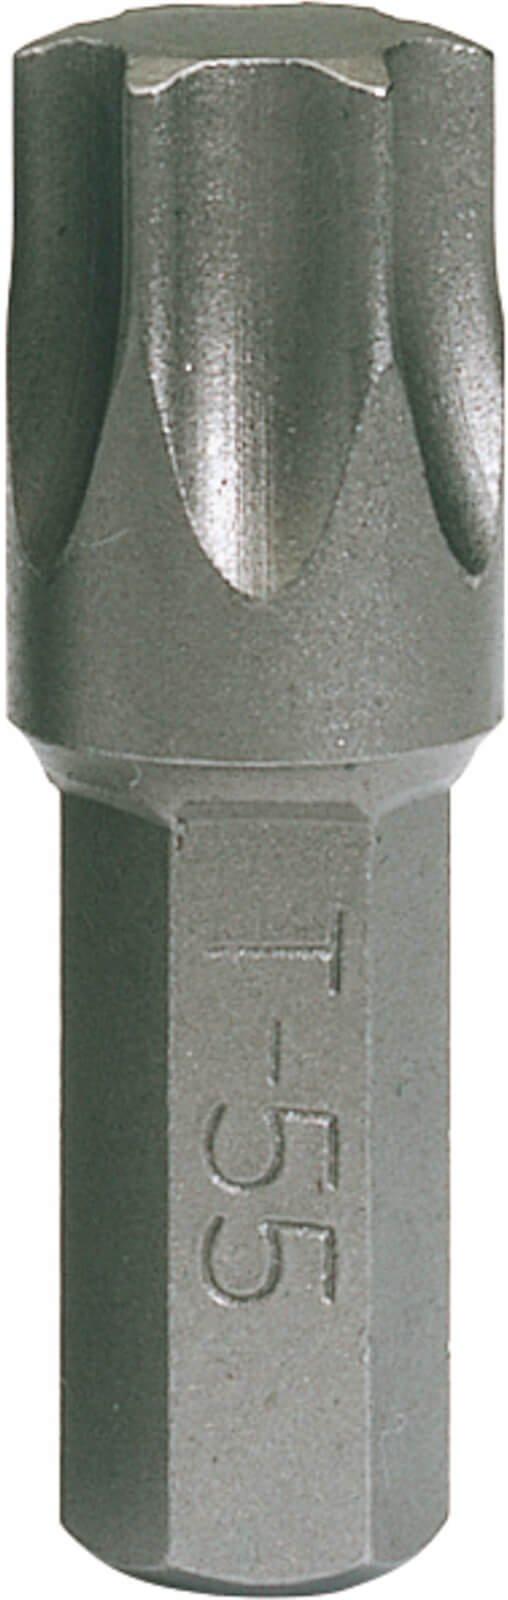 Draper 8mm Hex Shank Impact Torx Screwdriver Bit T55 25mm Pack of 1